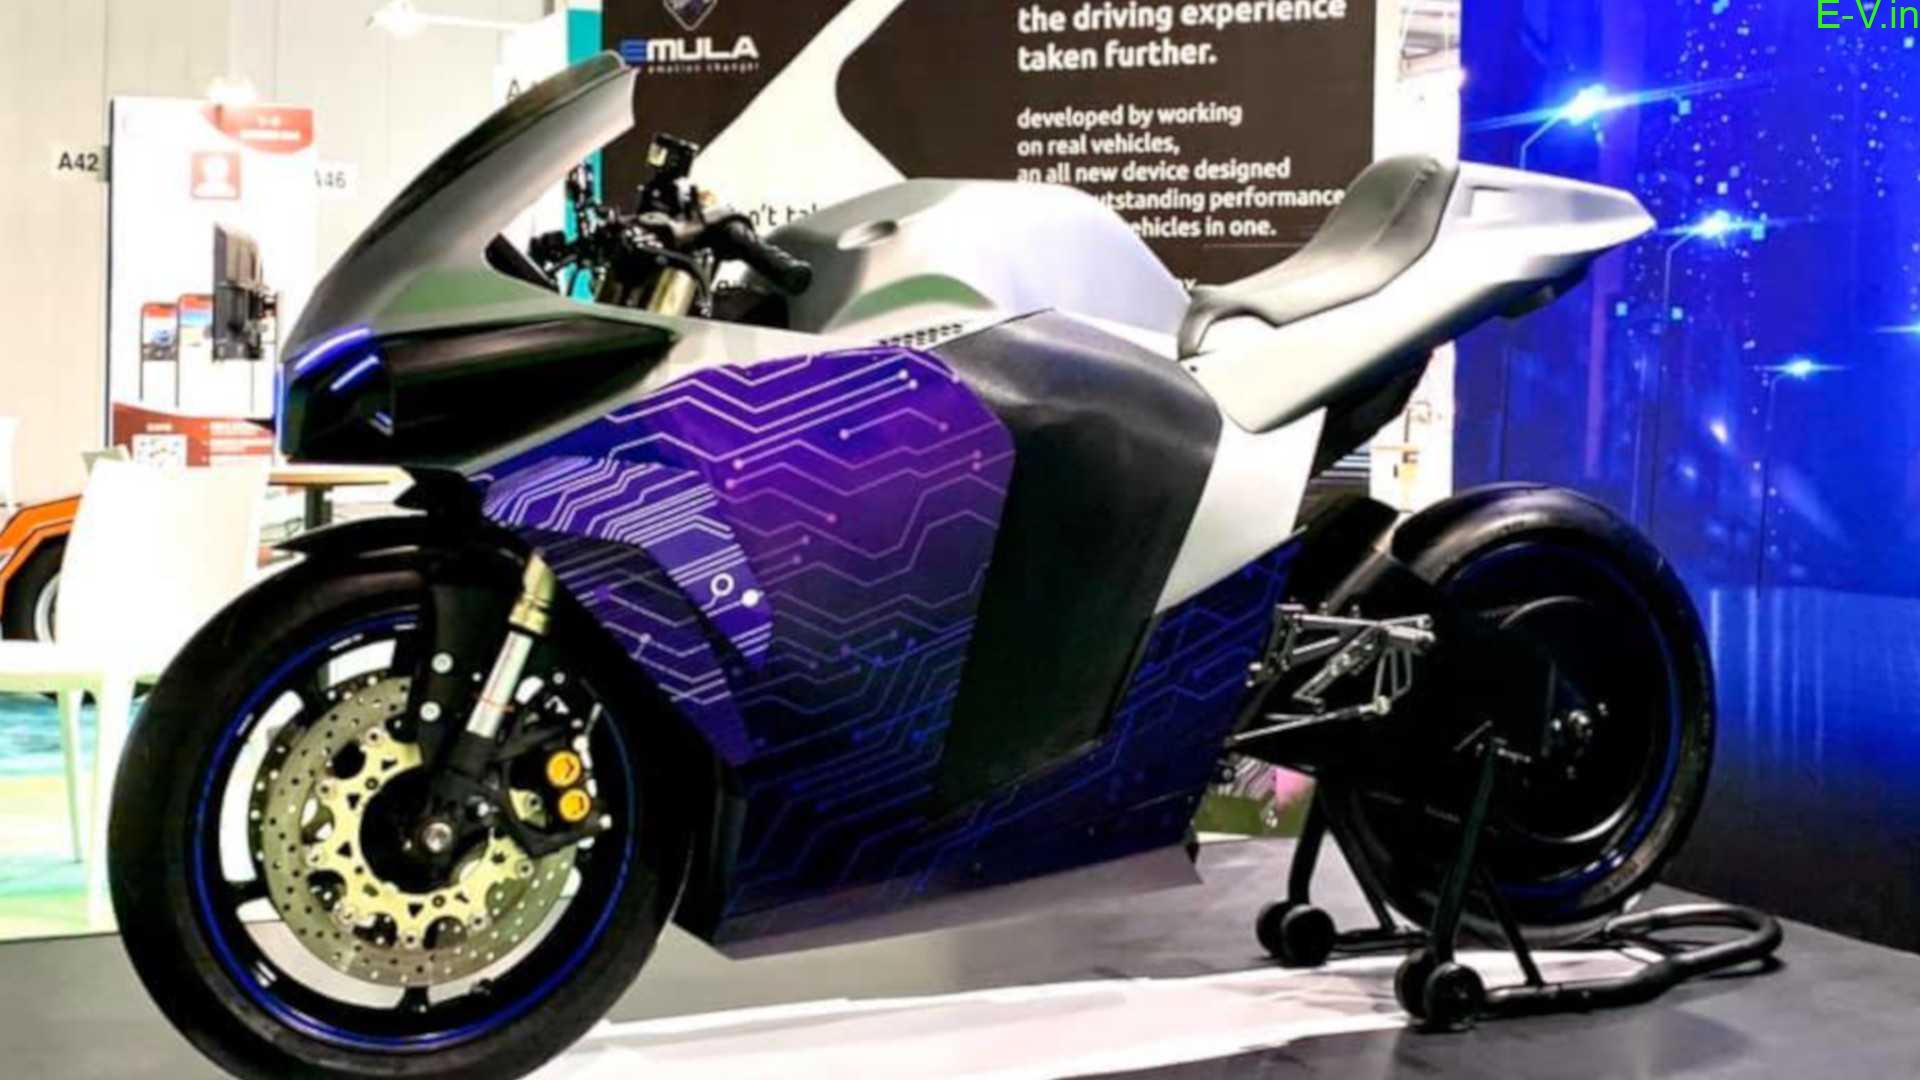 Emula Electric superbike concept